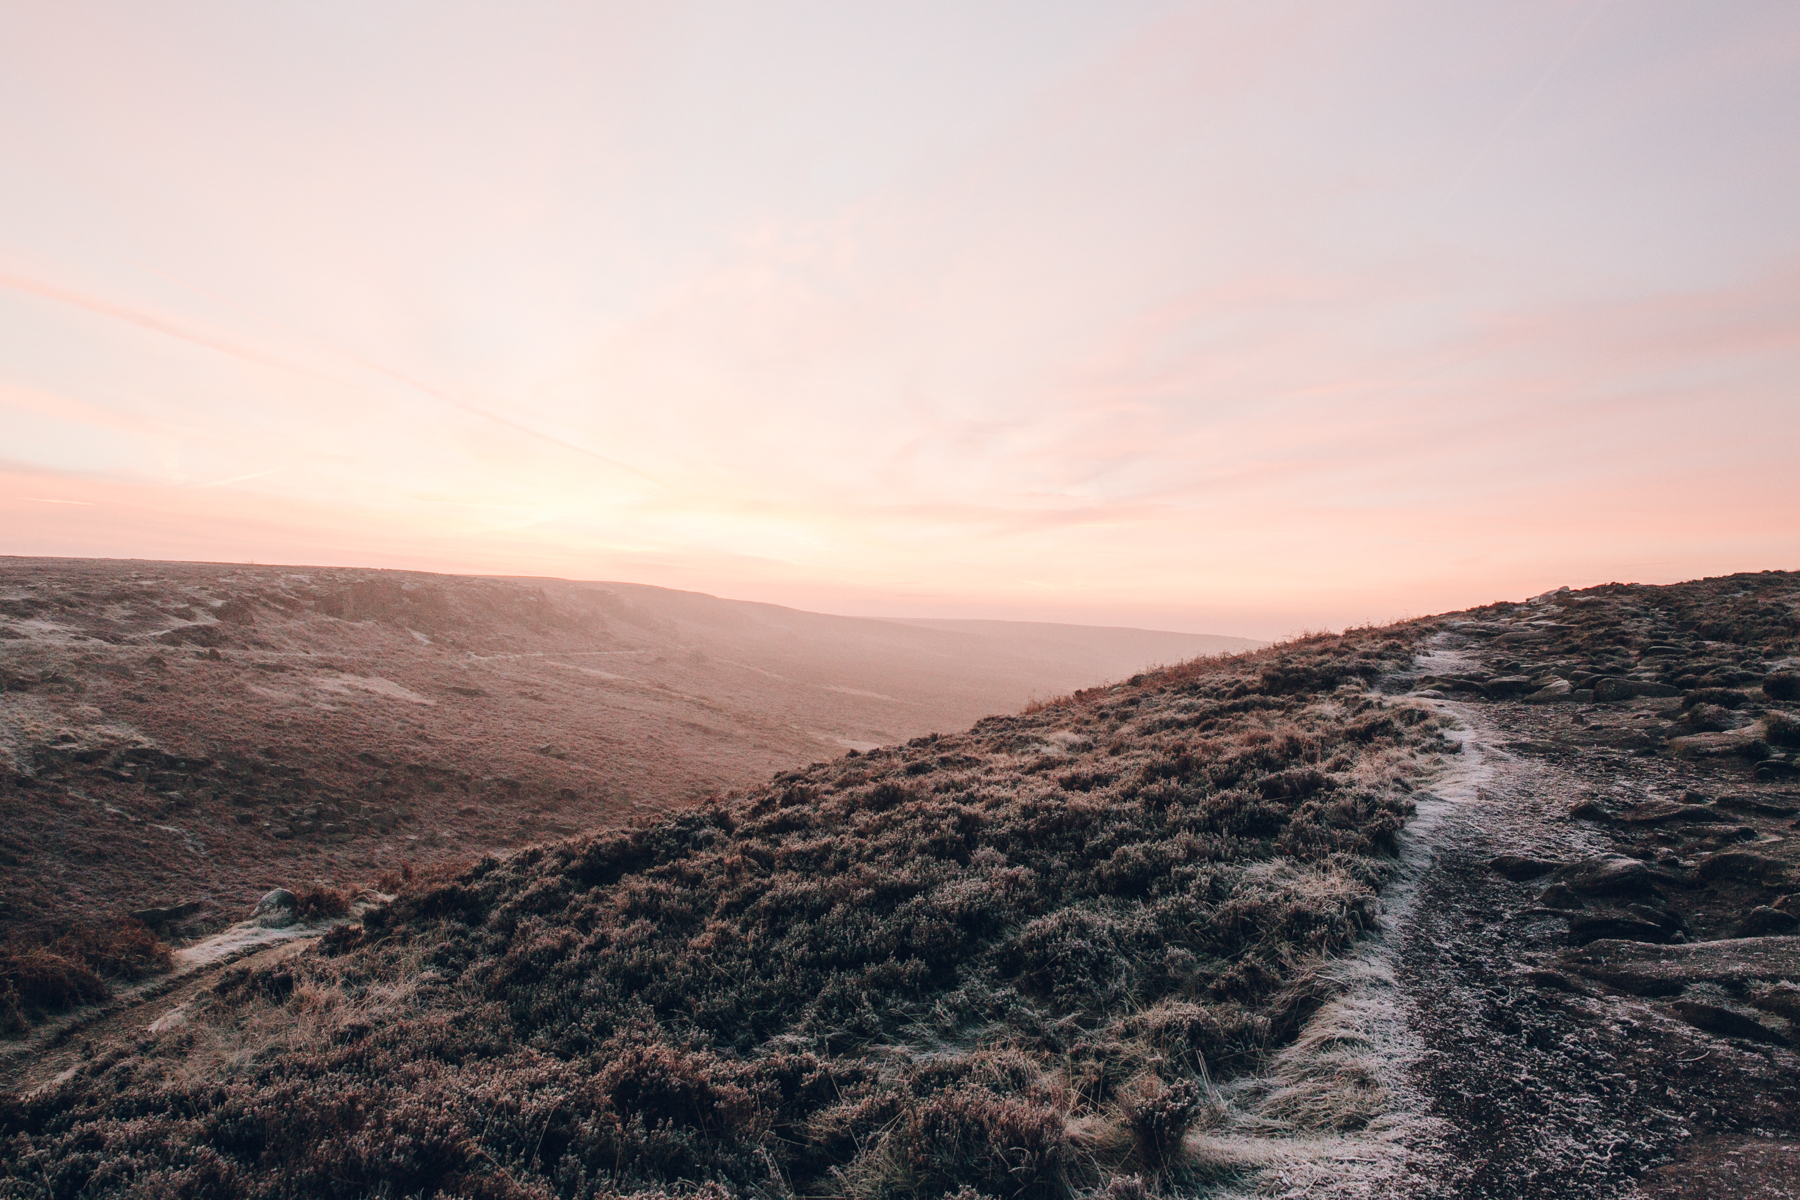 A frosty sunrise at Burbage Bridge in the Peak District, Derbyshire.